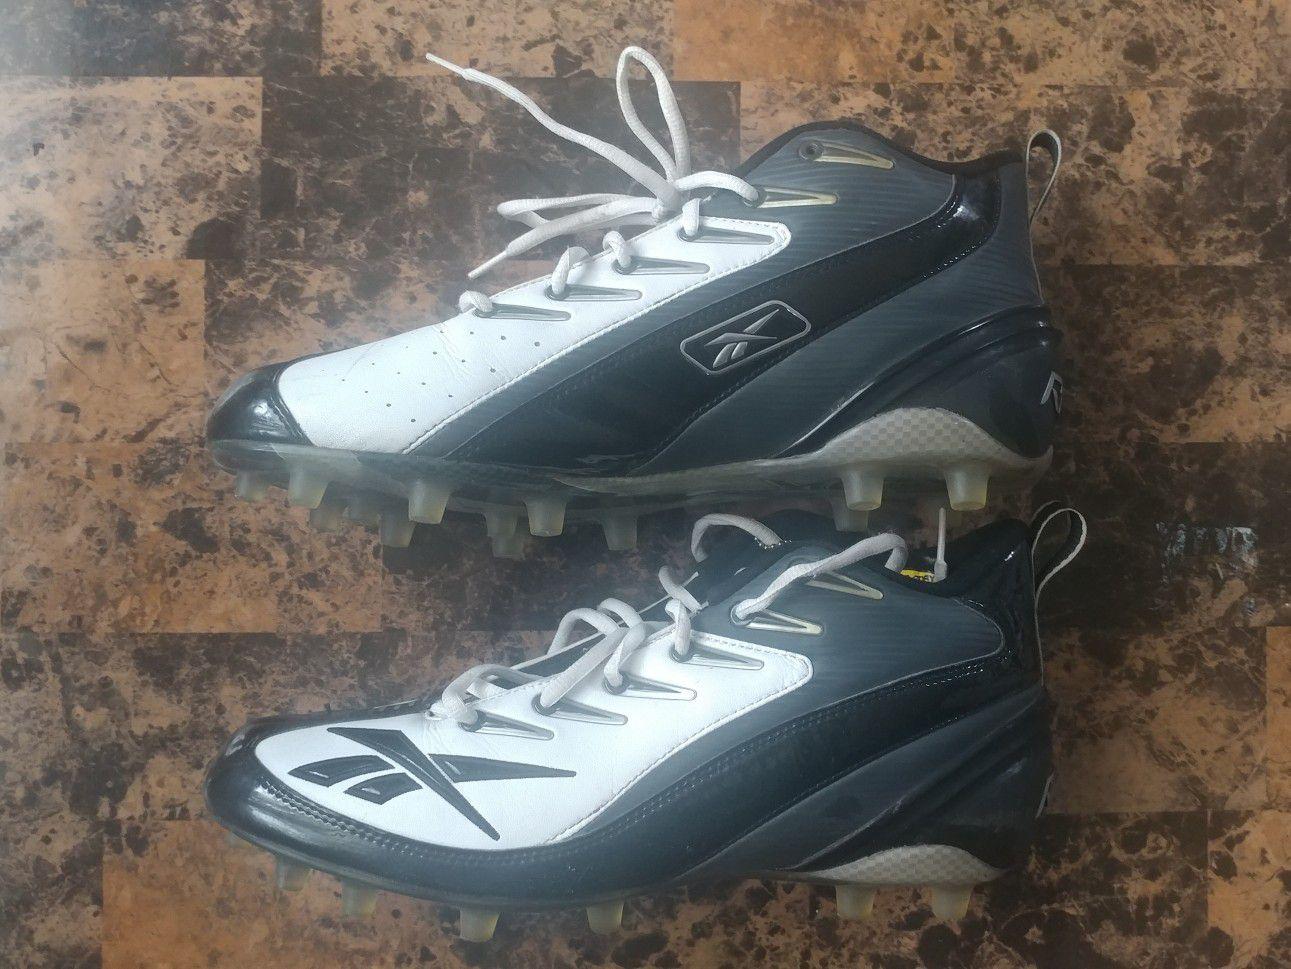 REEBOK MEN'S NFL 4 SPEED III MID FOOTBALL CLEATS SIZE:12